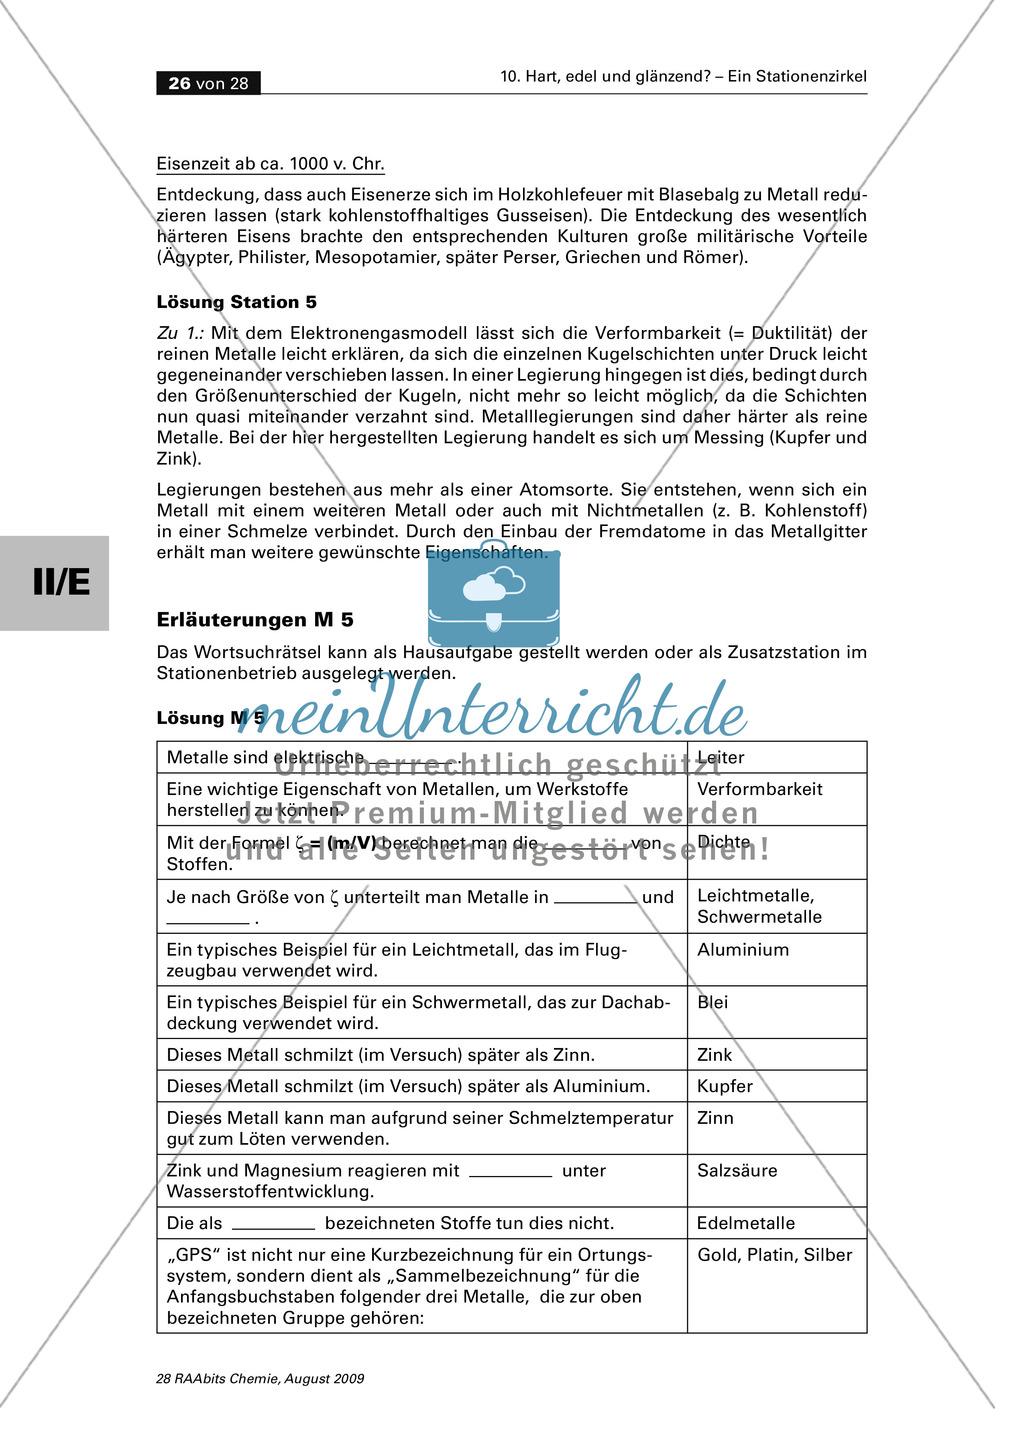 Fantastic Trends Im Periodensystem Arbeitsblatt Antworten ...